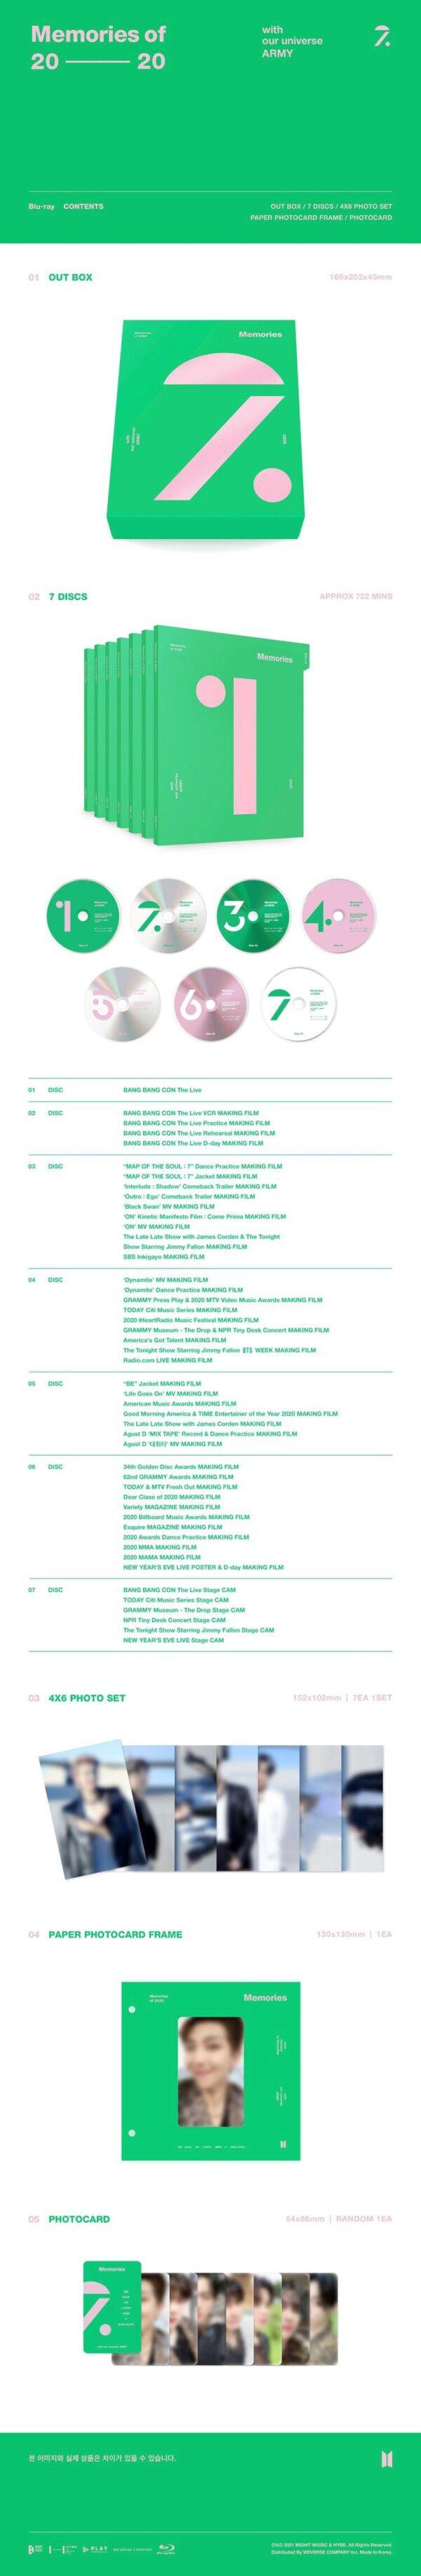 BTS Memories Of 2020 Blu ray 7 DISCOS